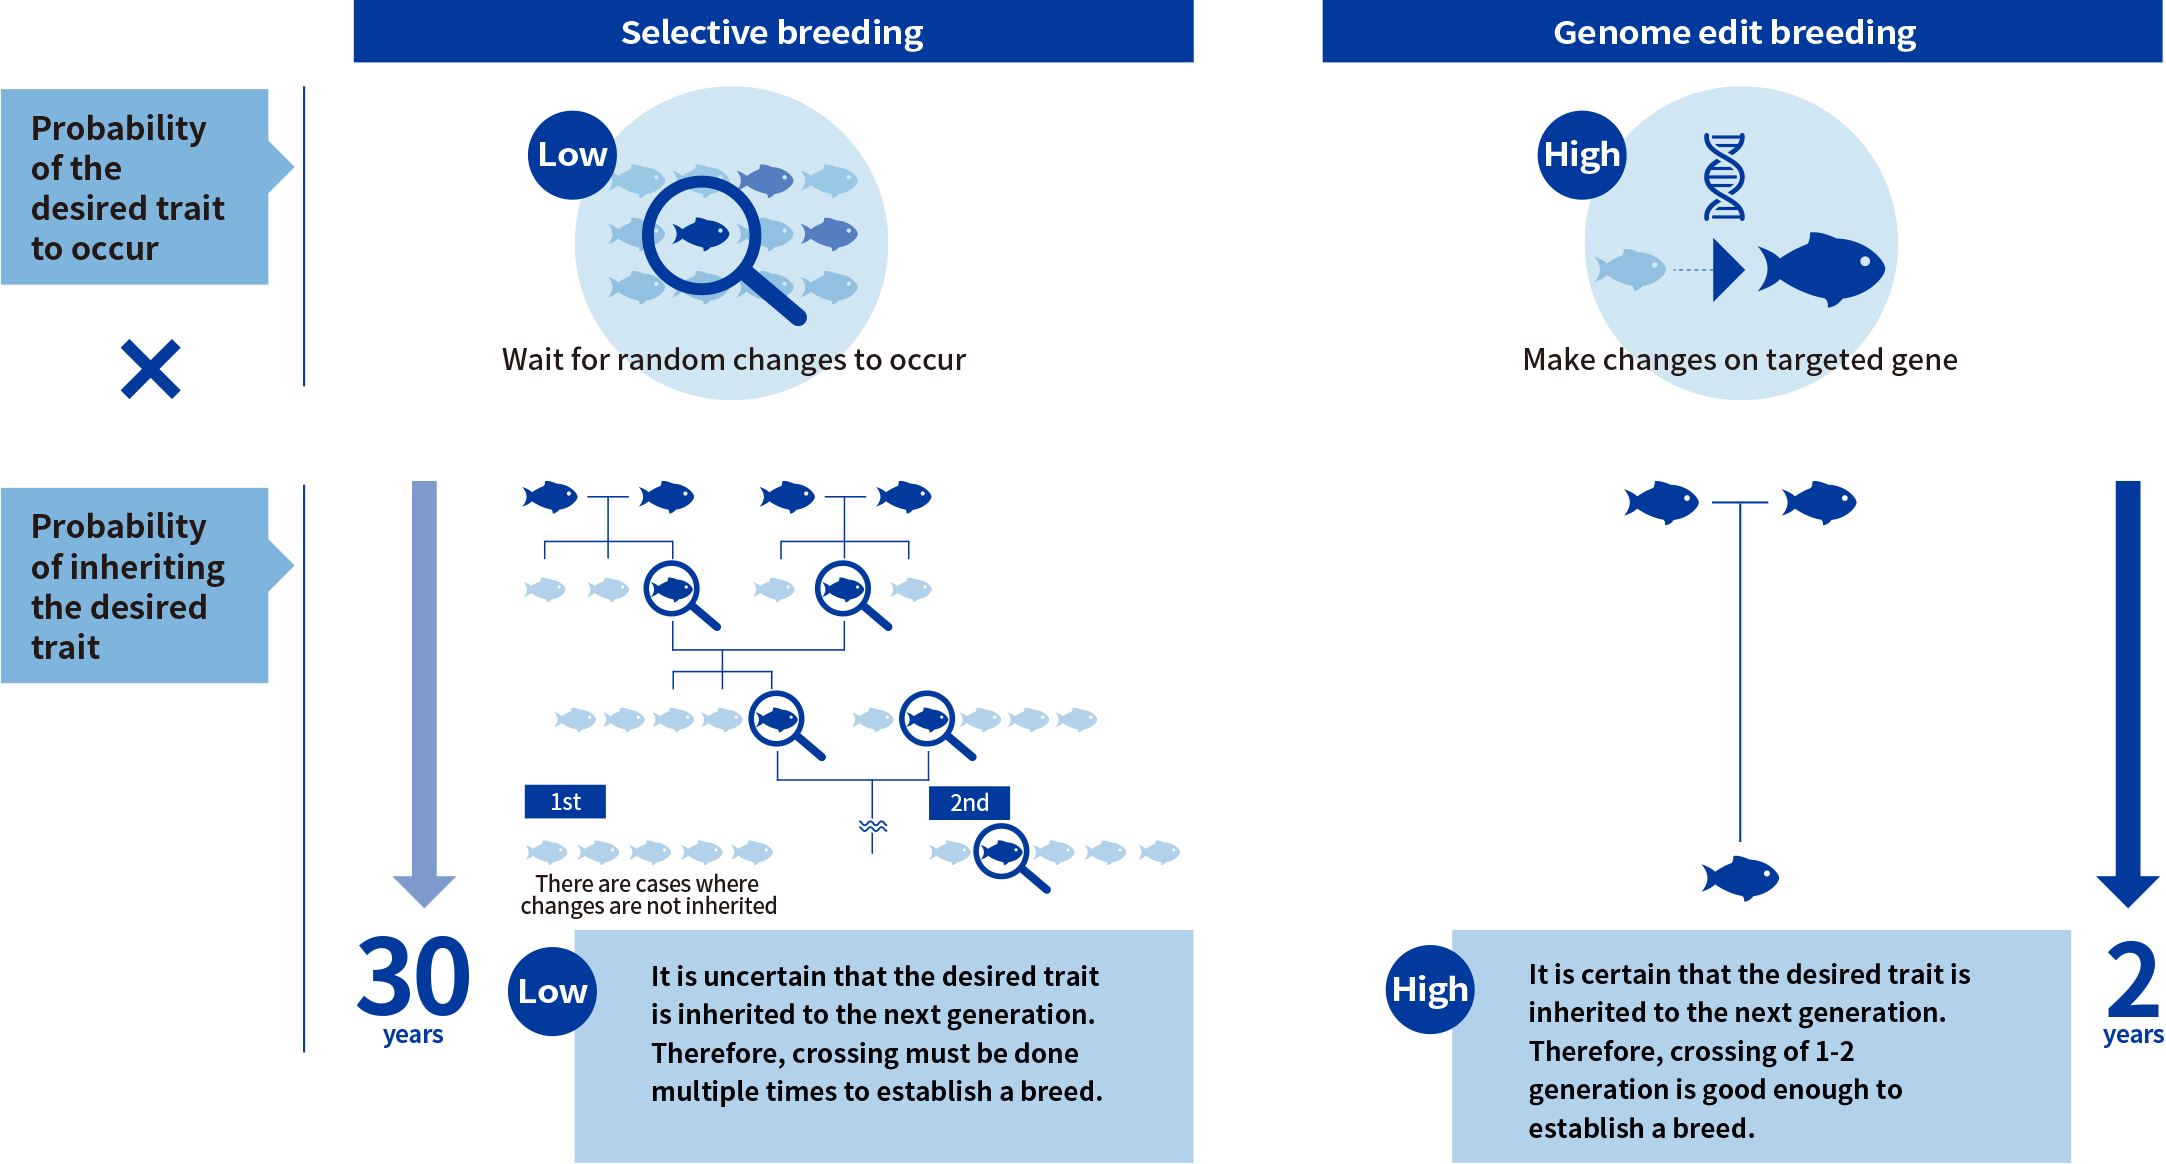 Selective breeding & Genome edit breeding